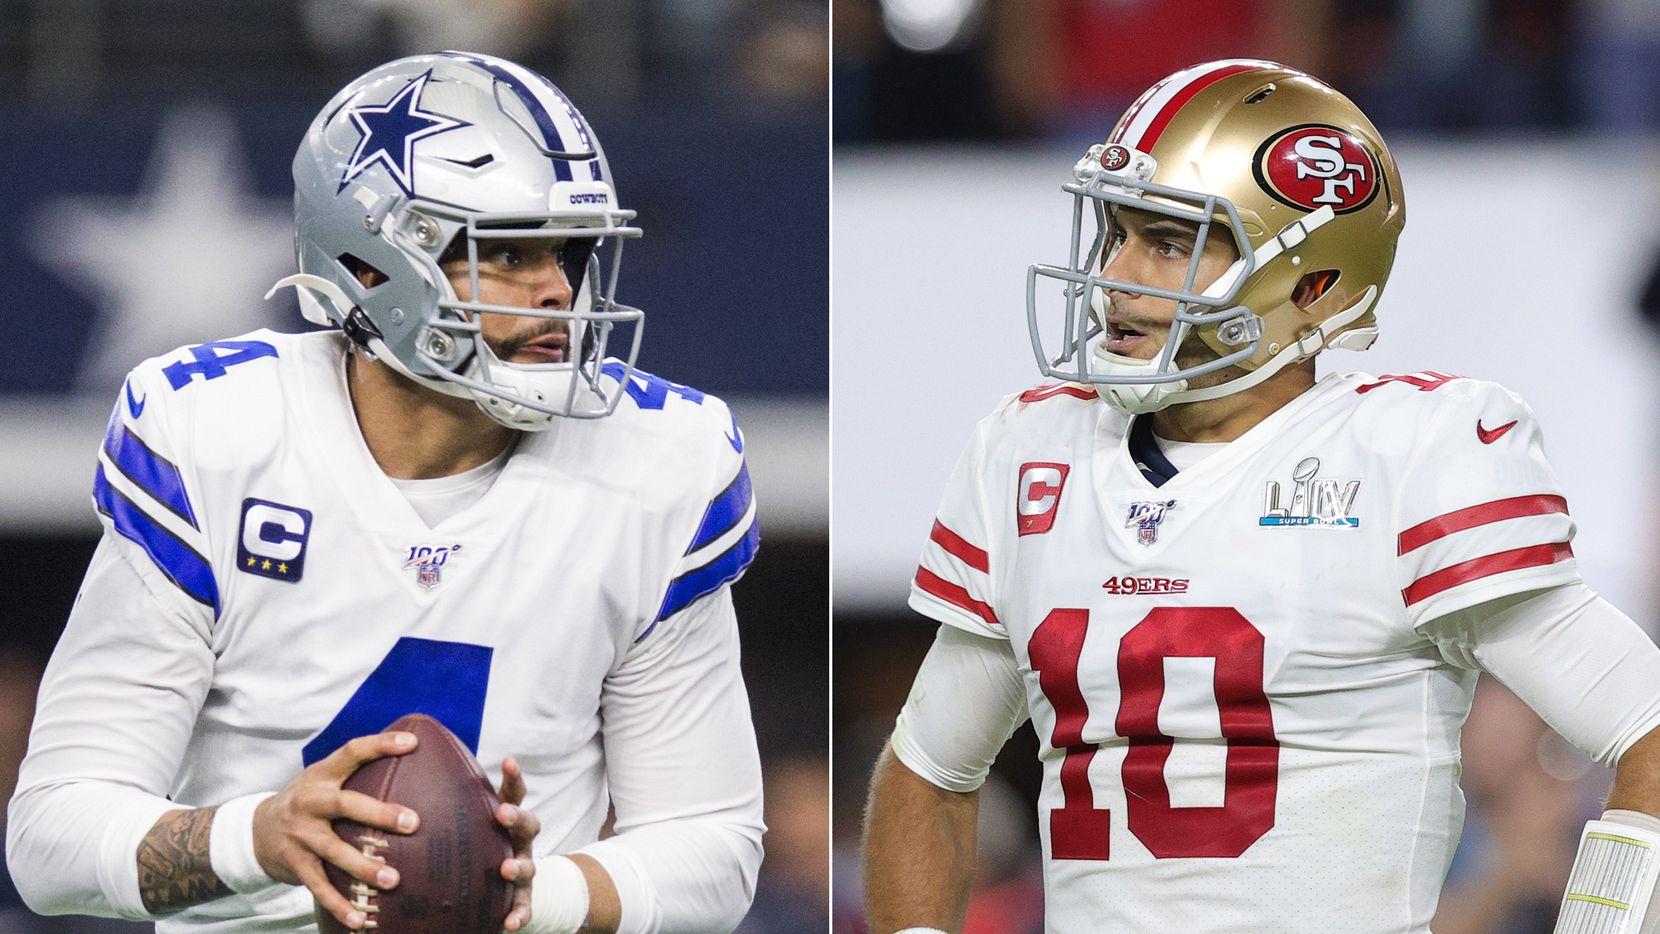 L to R: Dallas Cowboys quarterback Dak Prescott (Ashley Landis/The Dallas Morning News), San Francisco 49ers quarterback Jimmy Garoppolo (Tom Pennington/Getty Images)